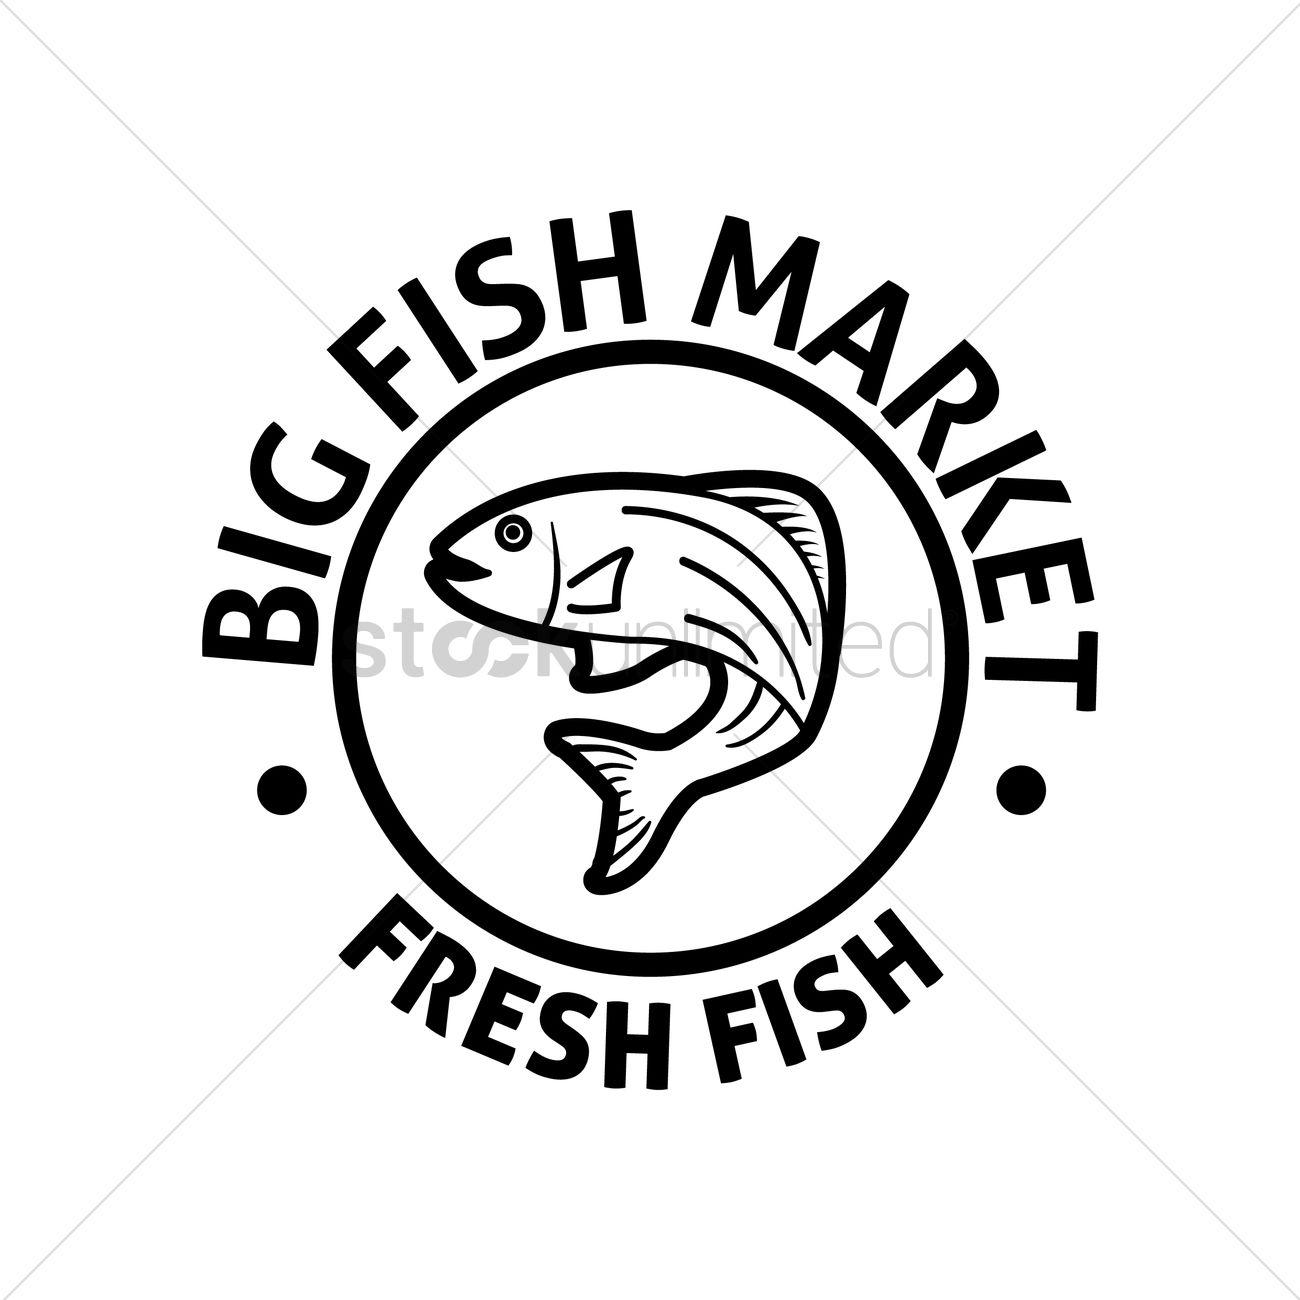 Big Fish Market Label Vector Image 1530148 Stockunlimited